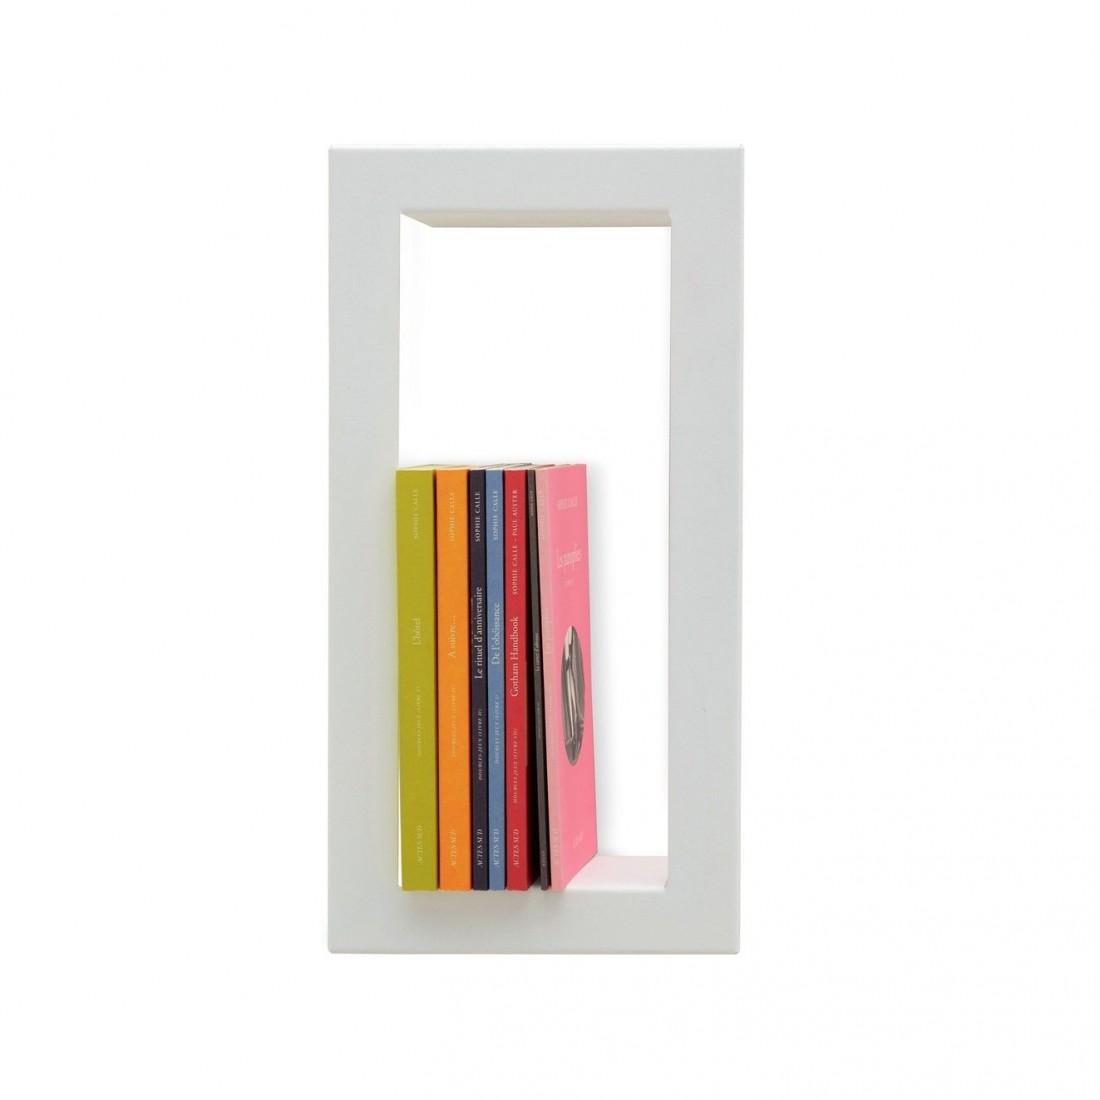 etag re en m tal color highstick design fran ais presse. Black Bedroom Furniture Sets. Home Design Ideas